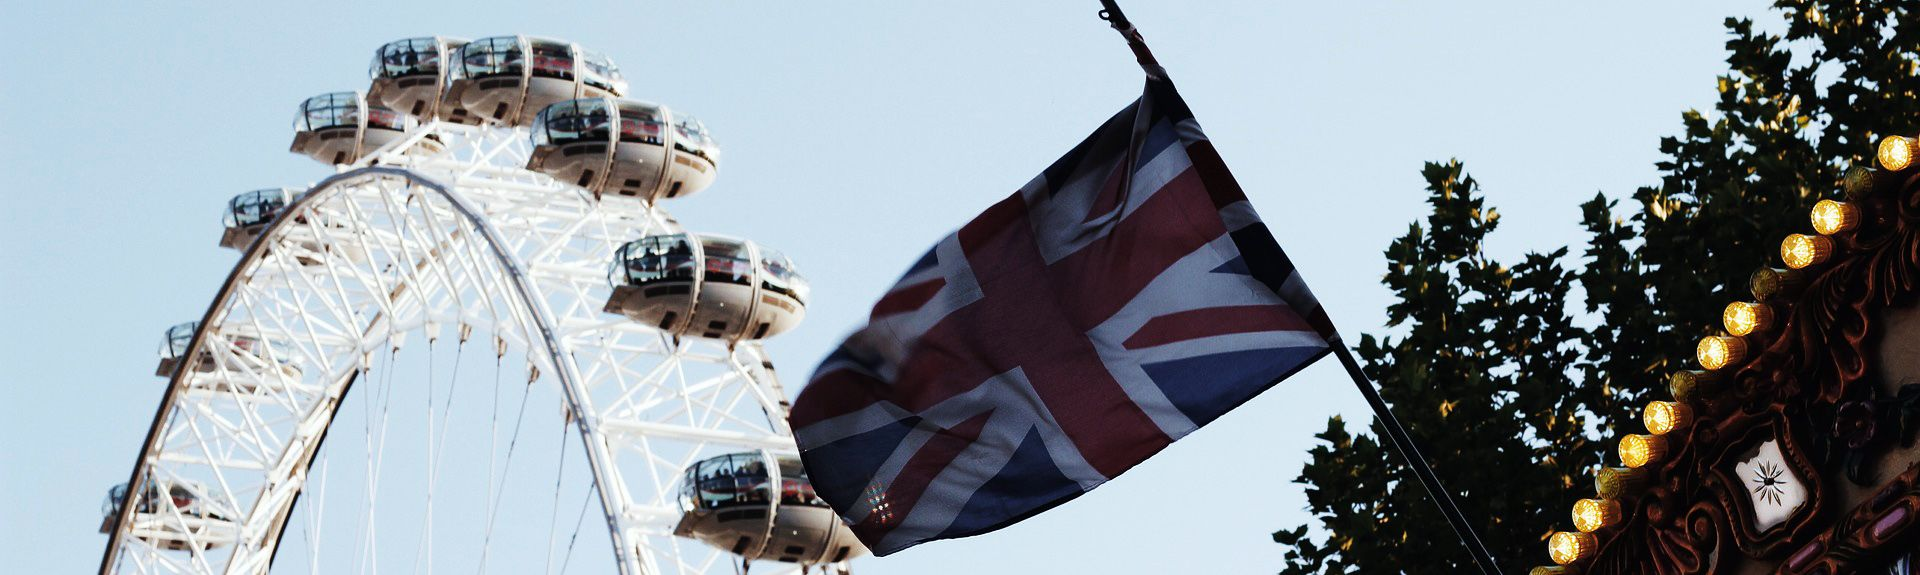 Canary Wharf, Lontoo, Englanti, Yhdistynyt kuningaskunta